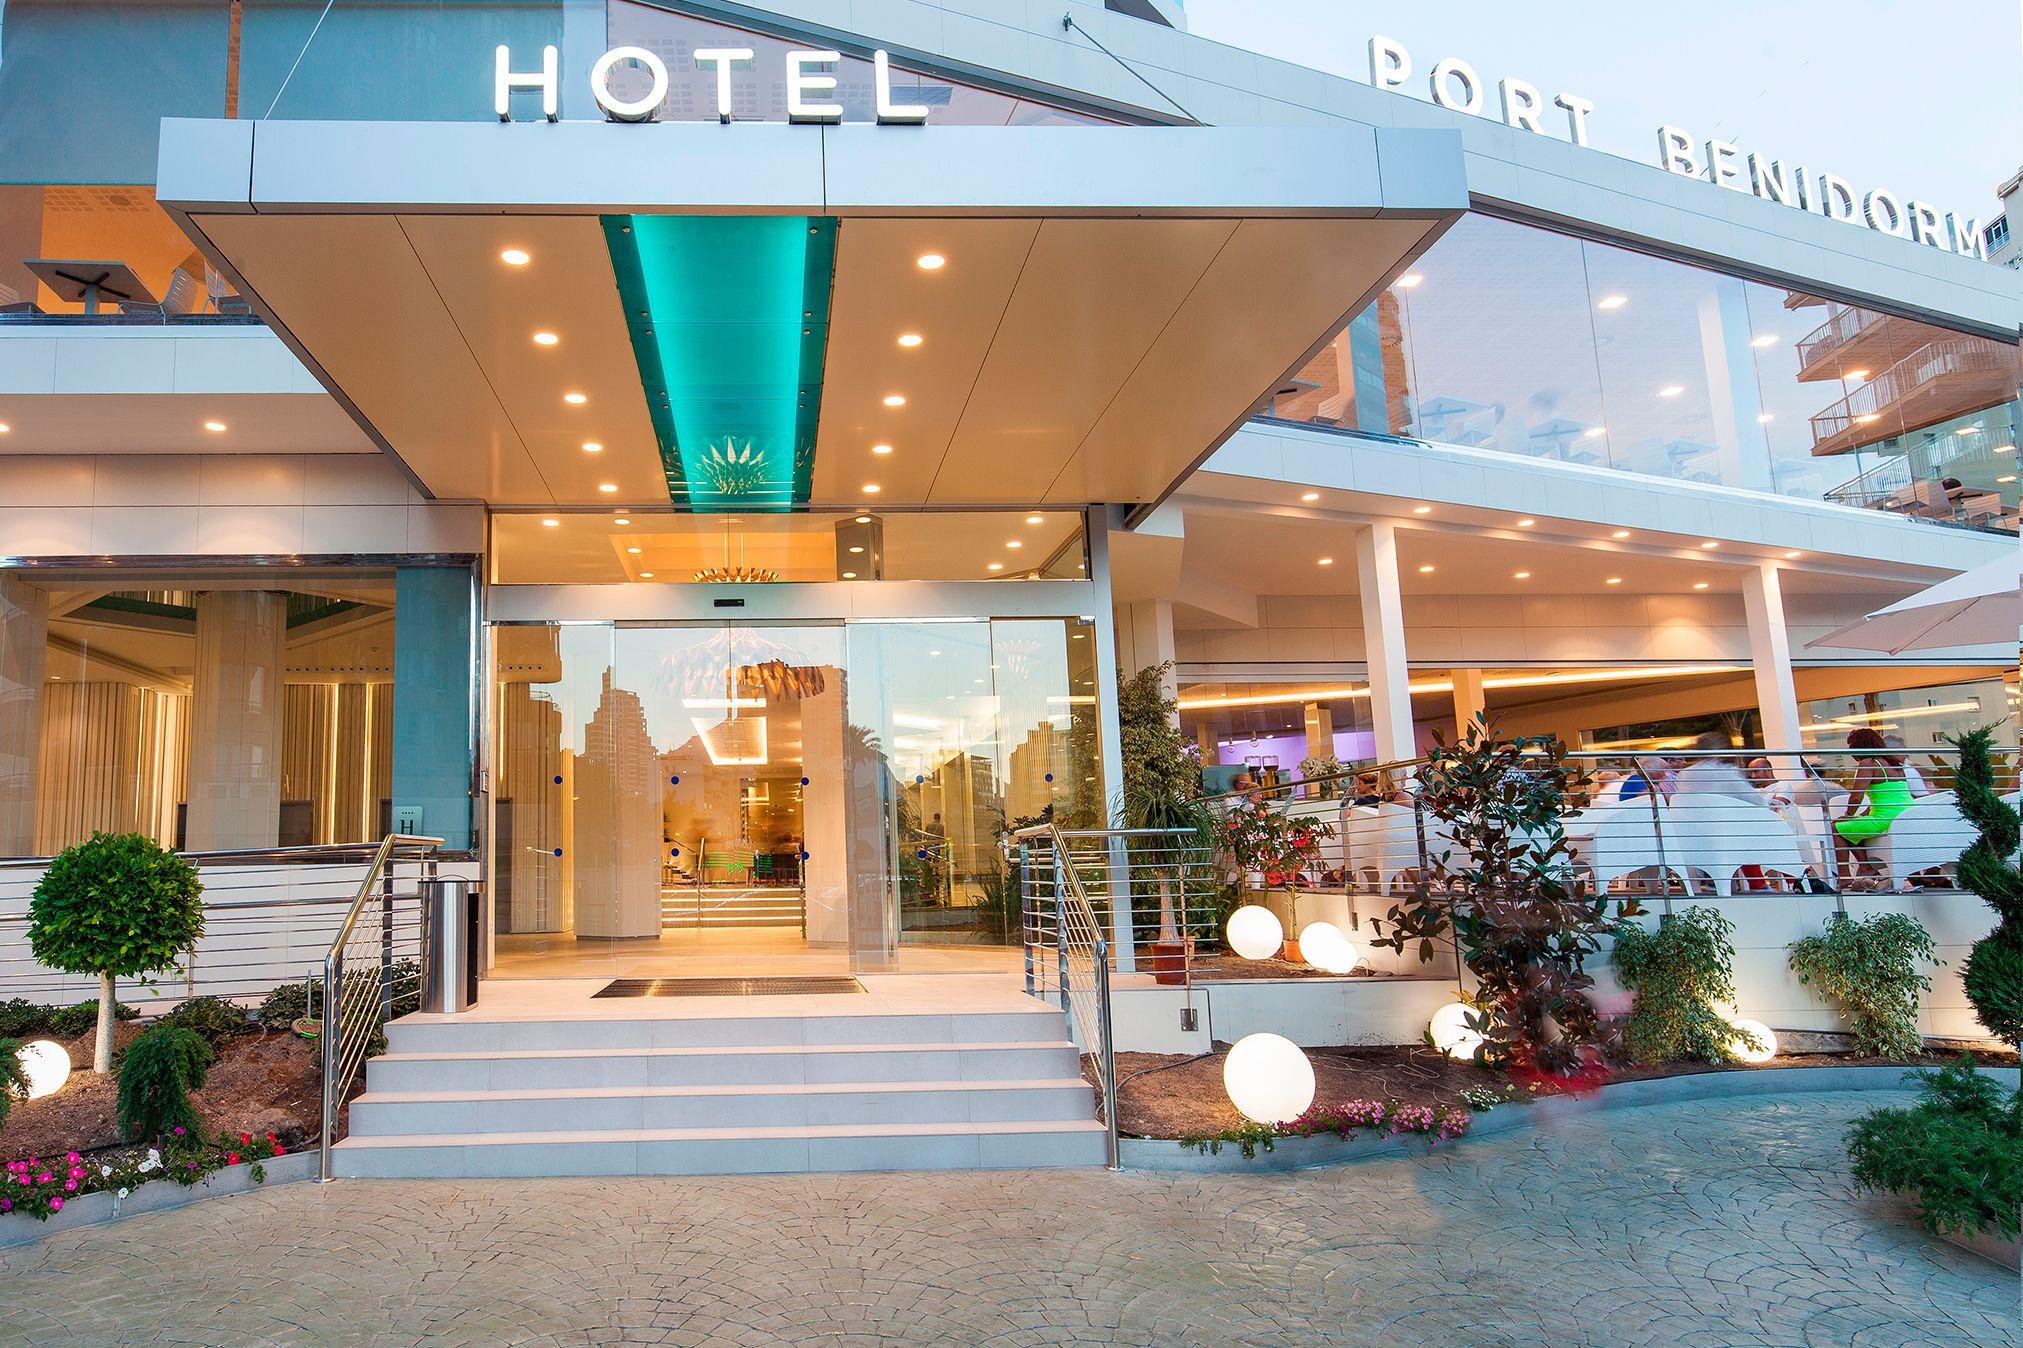 Oferta nochevieja en hotel port benidorm 4 benidorm - Hotel port salins 4 empuriabrava ...